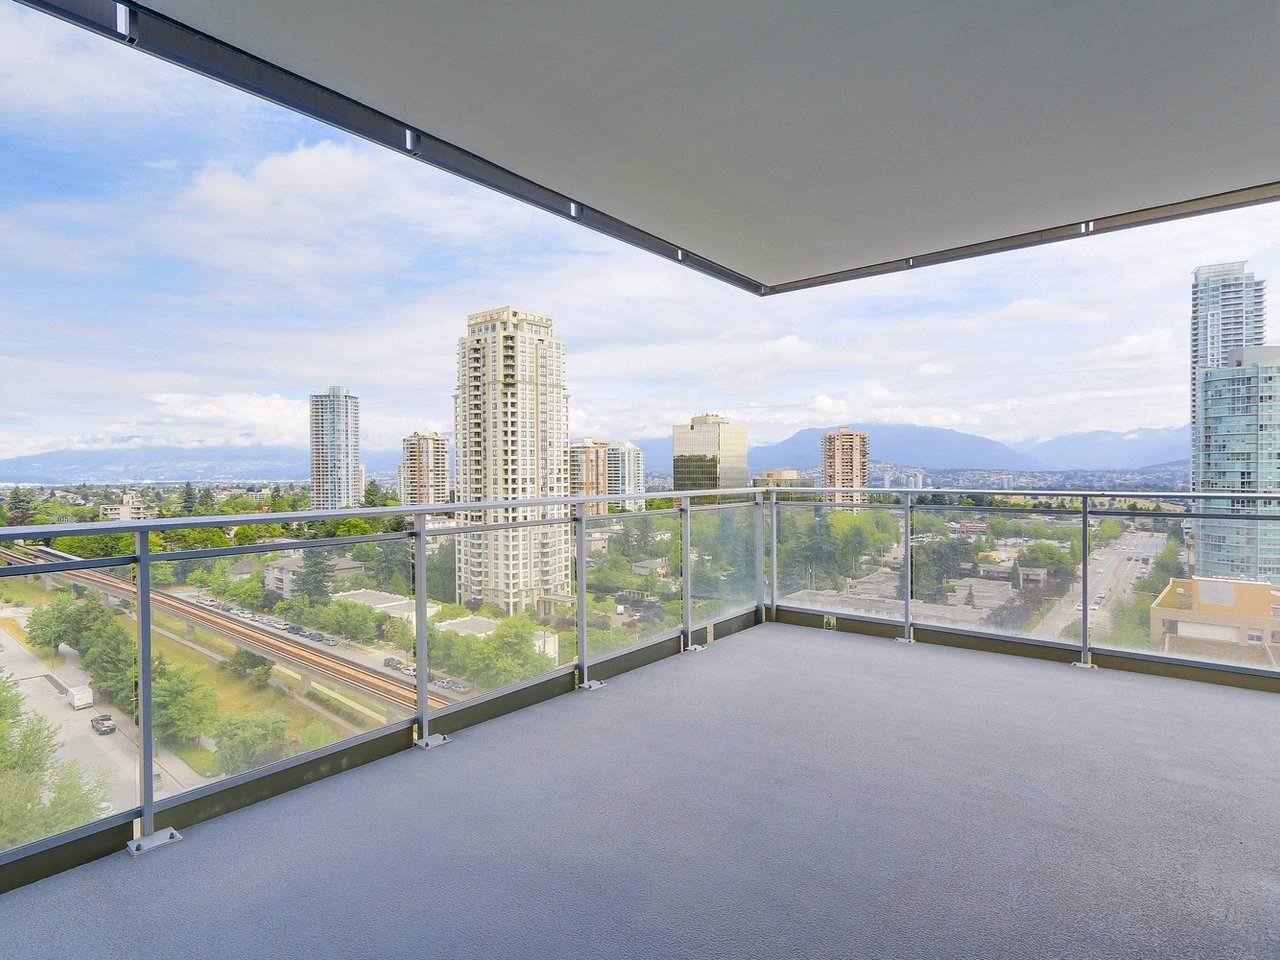 Condo Apartment at 1202 4360 BERESFORD STREET, Unit 1202, Burnaby South, British Columbia. Image 14